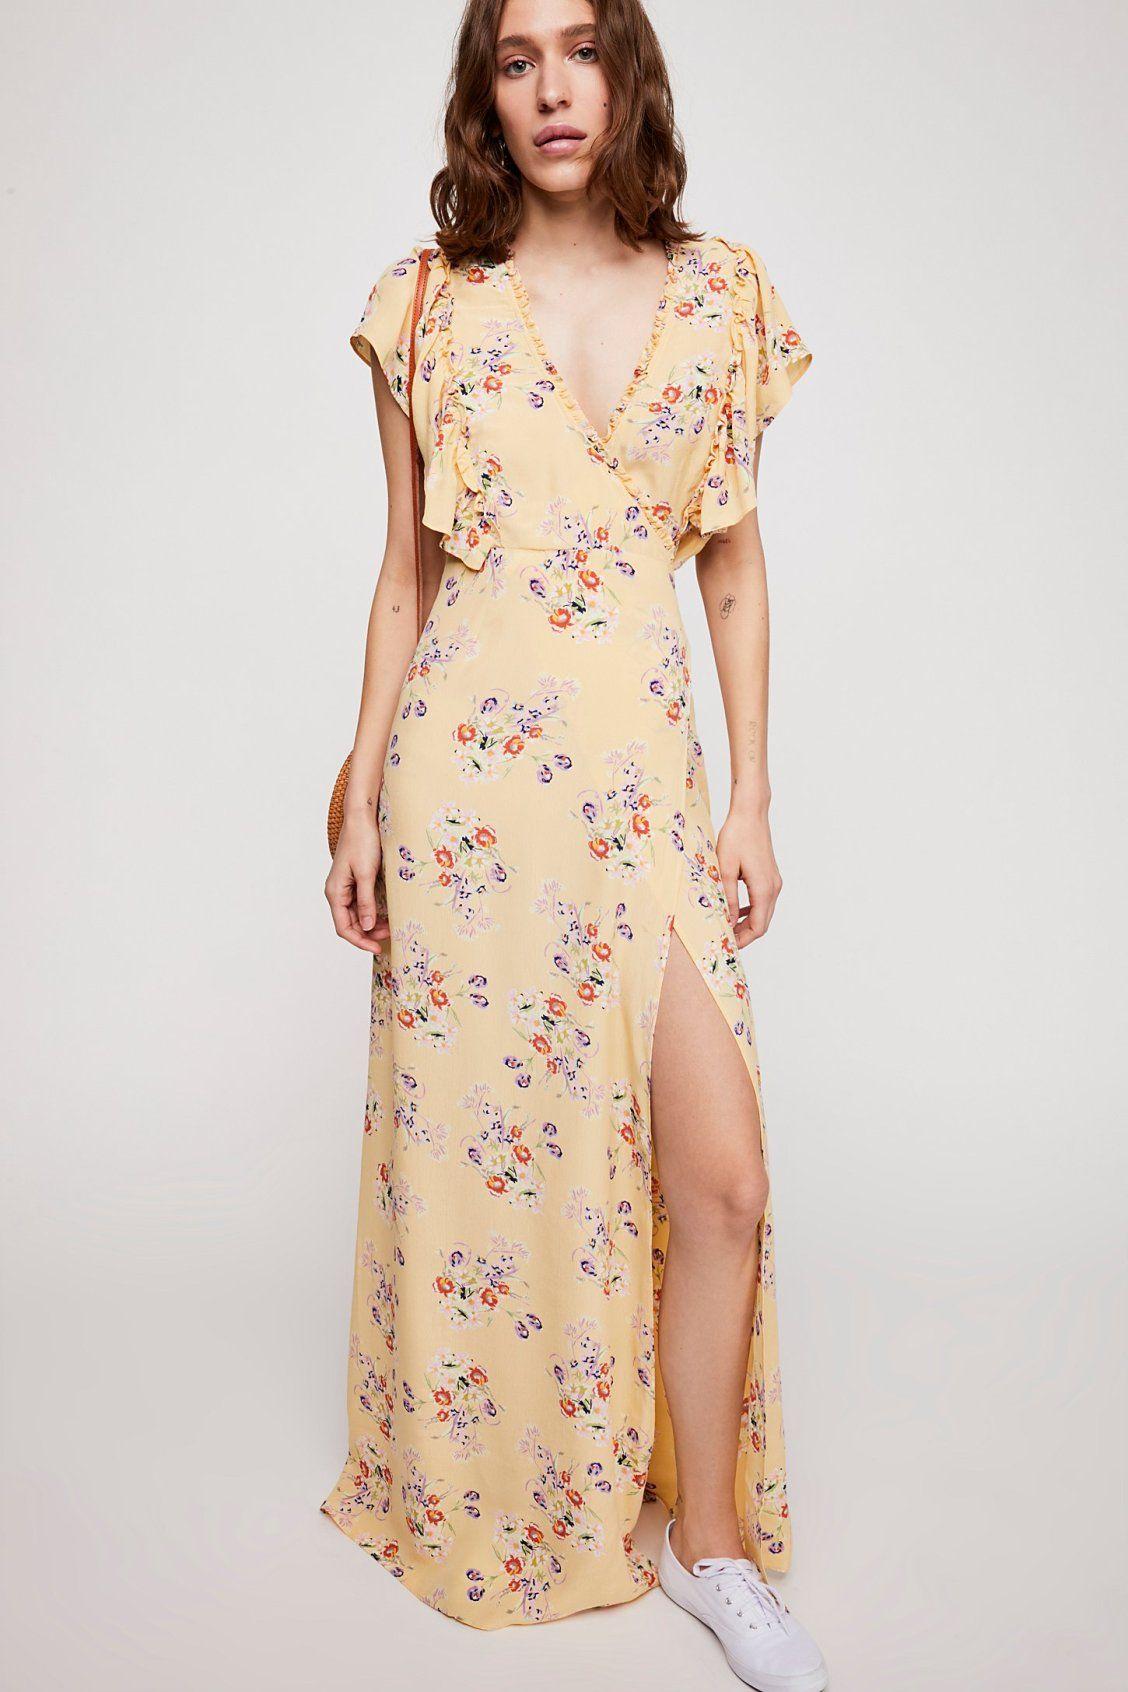 beb12ca27d16f Shiny Vintage Wrap Dress